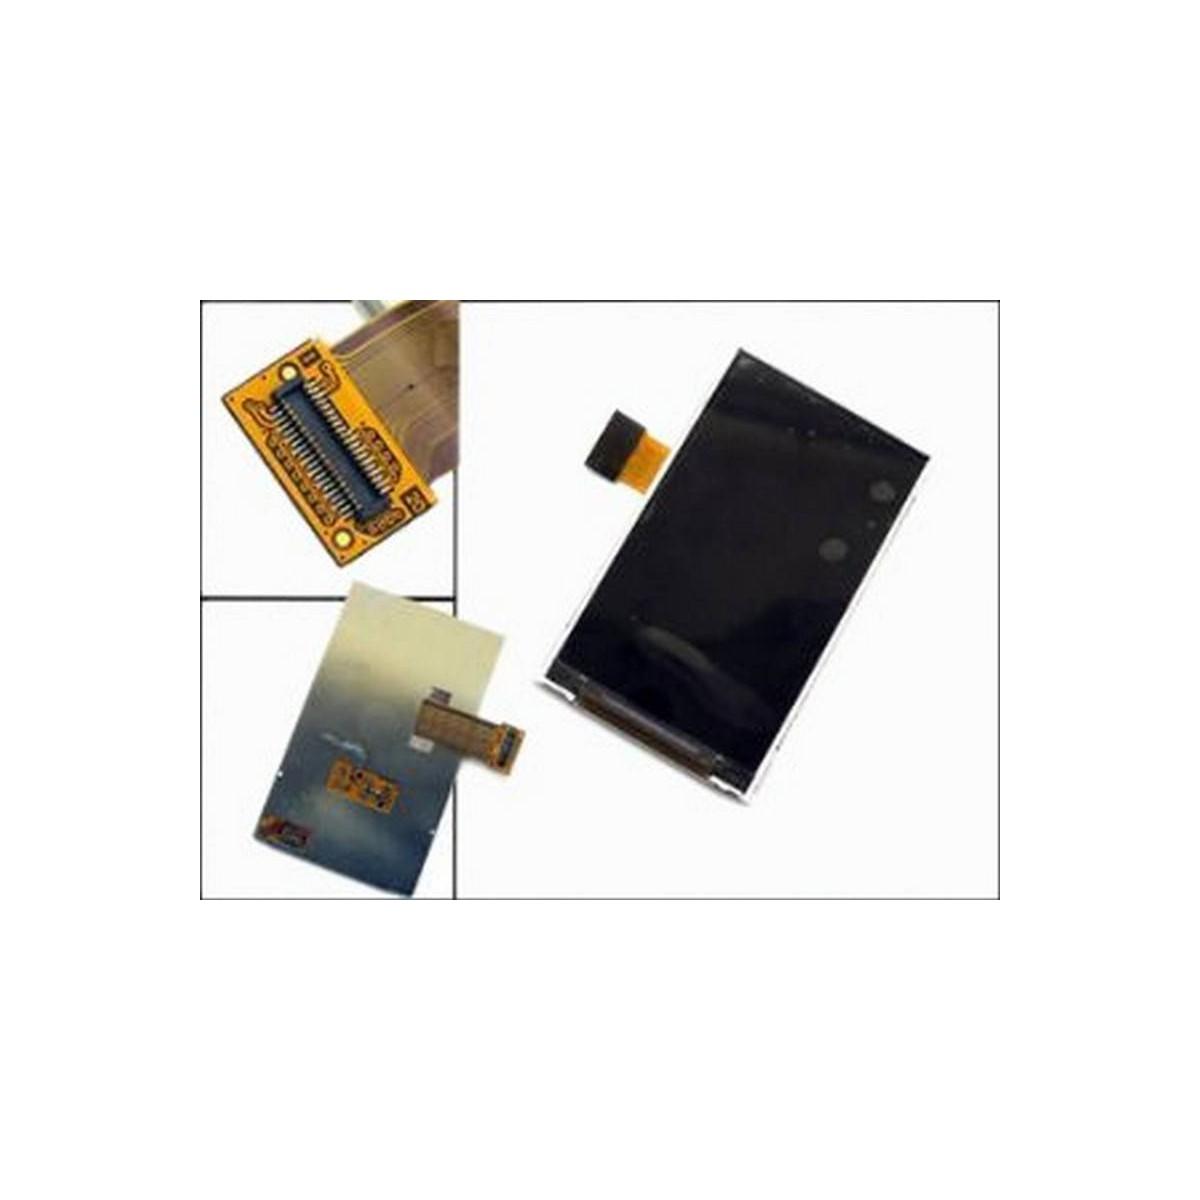 LCD LG KP500 KP502 KP505